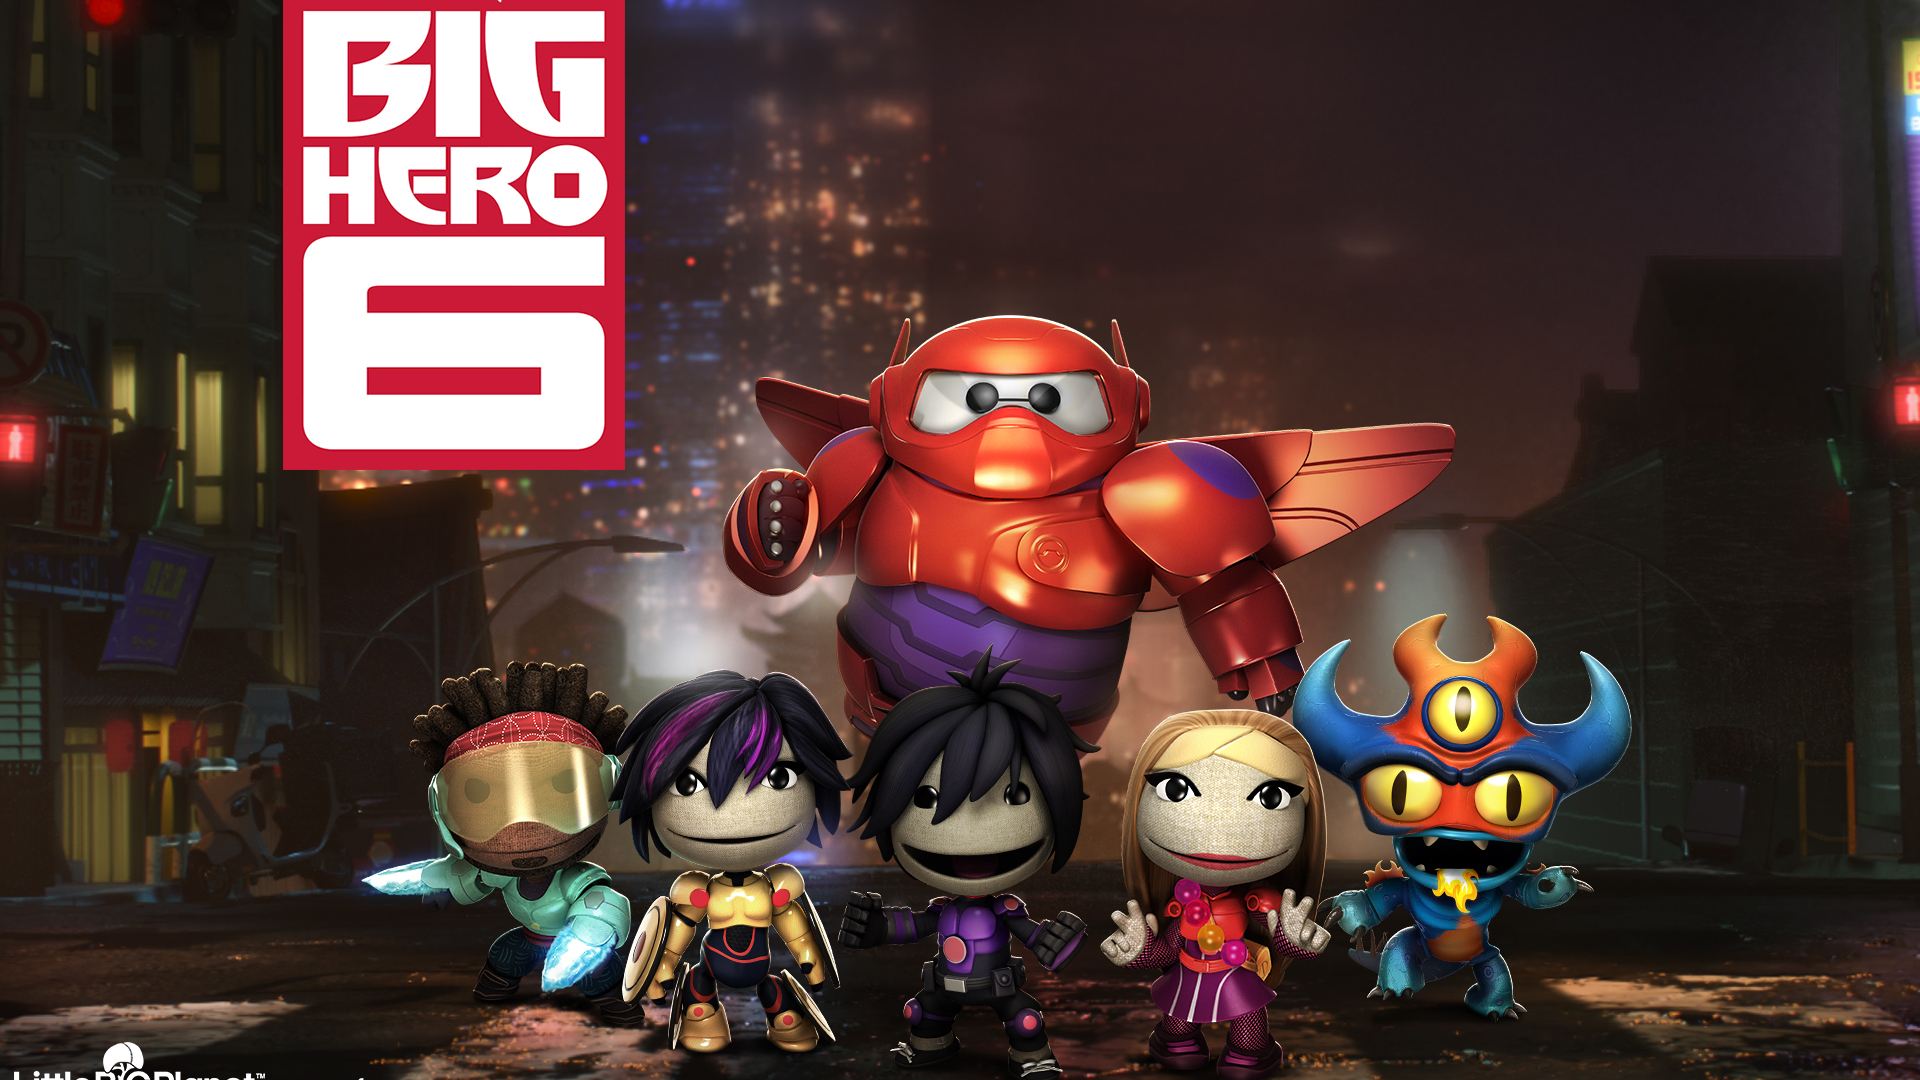 big hero 6 baymax 1080p